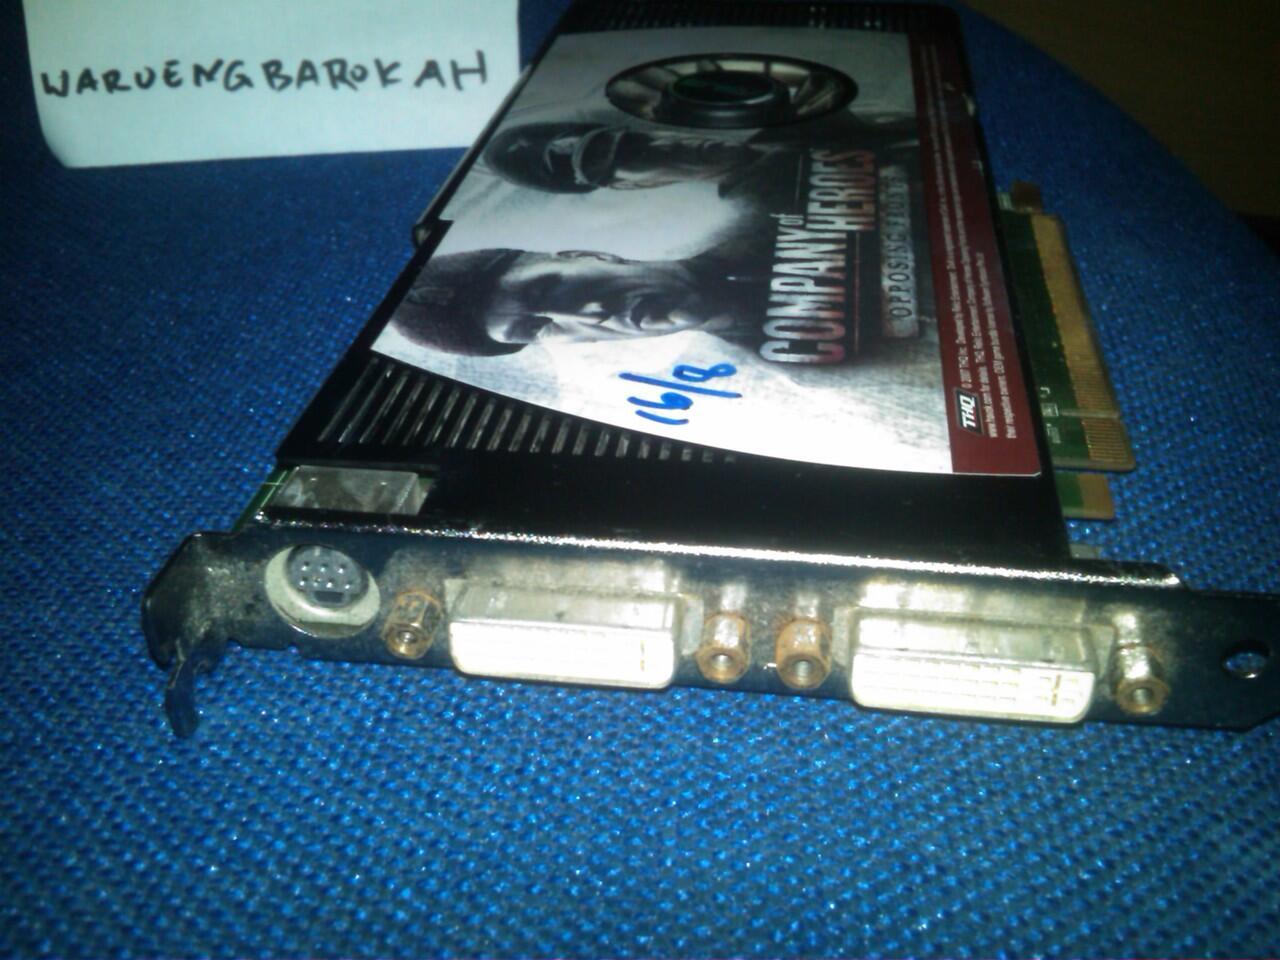 VGA PCIE Asus NVidia Geforce 8800GT TOP 512MB 256bit DDR3 Bandung